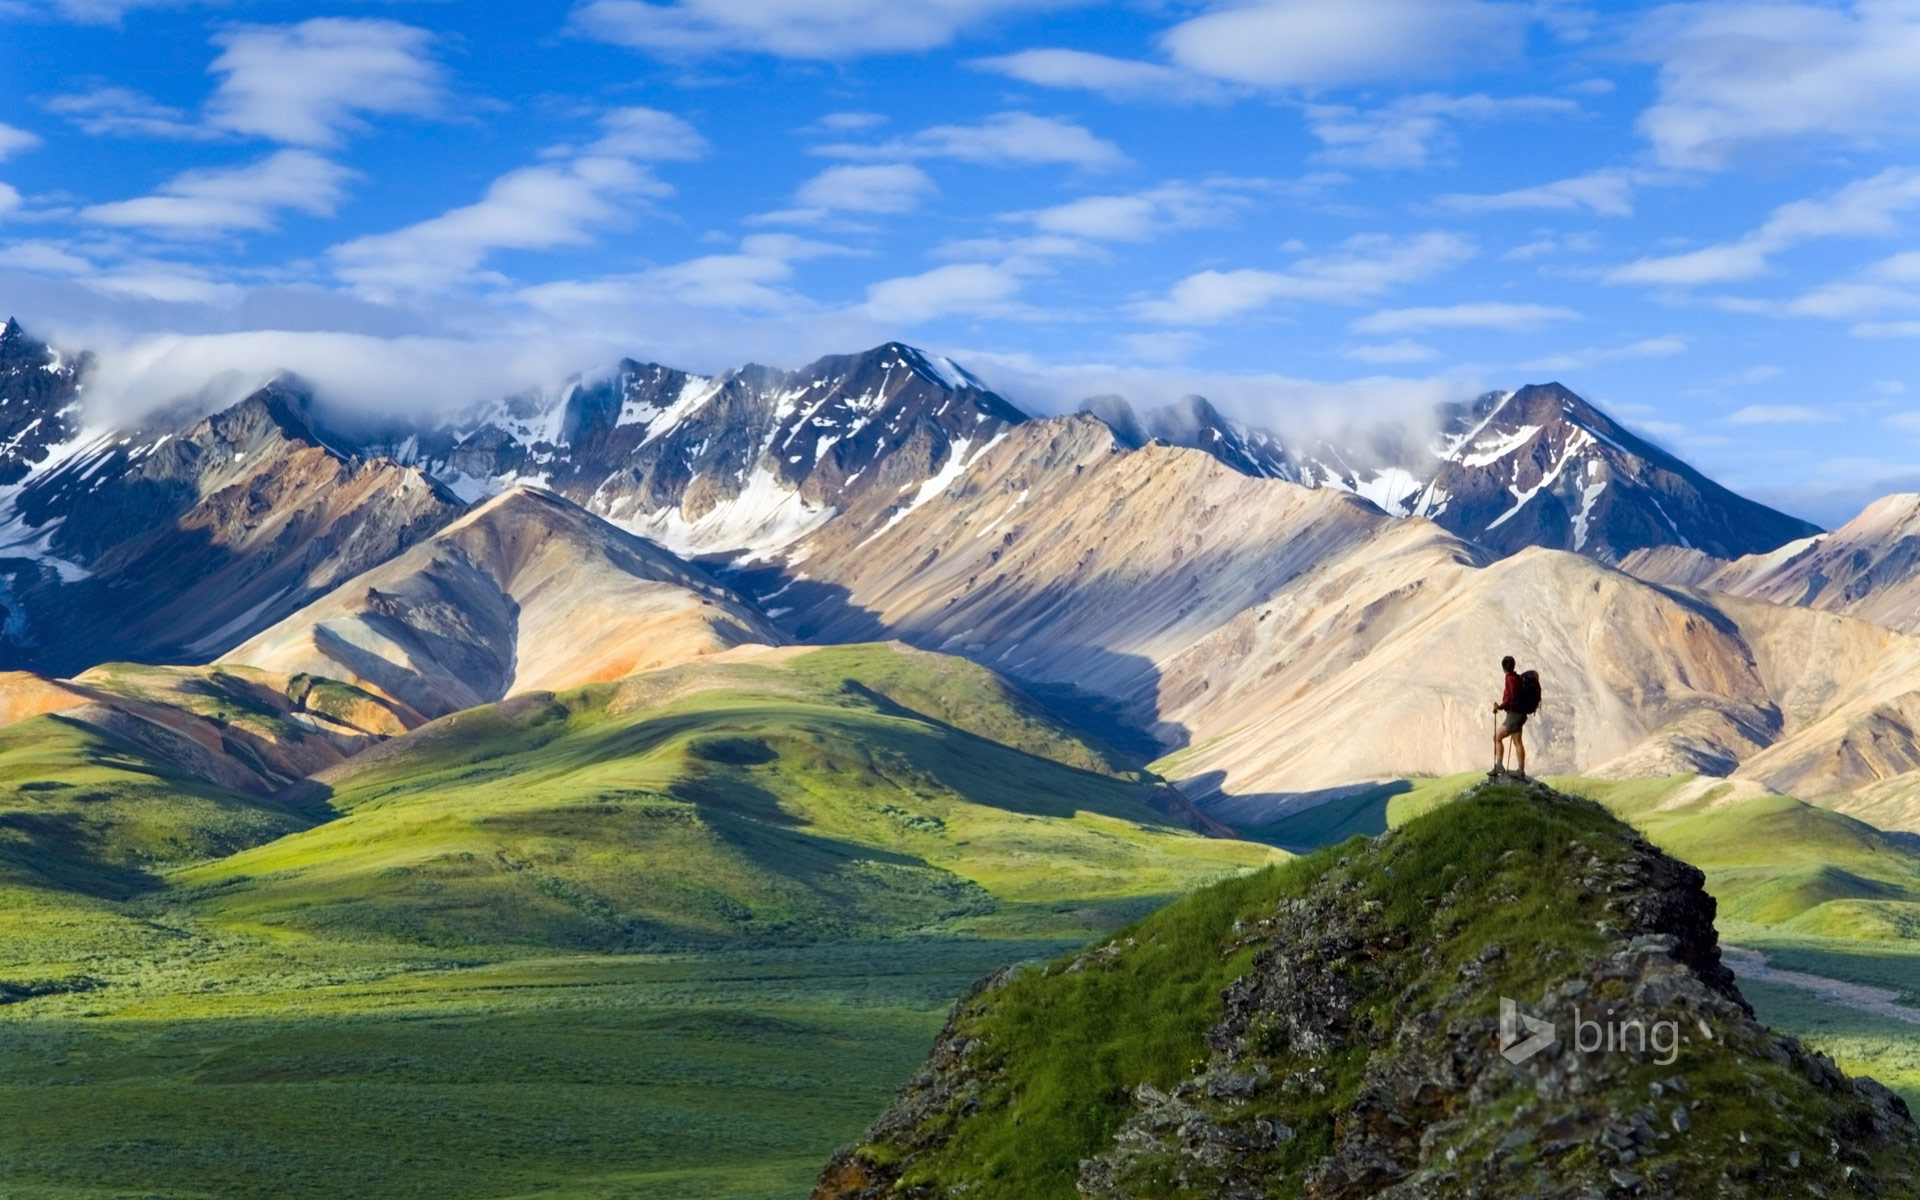 Denali National Park Wallpapers HD Wallpapers 1920x1200